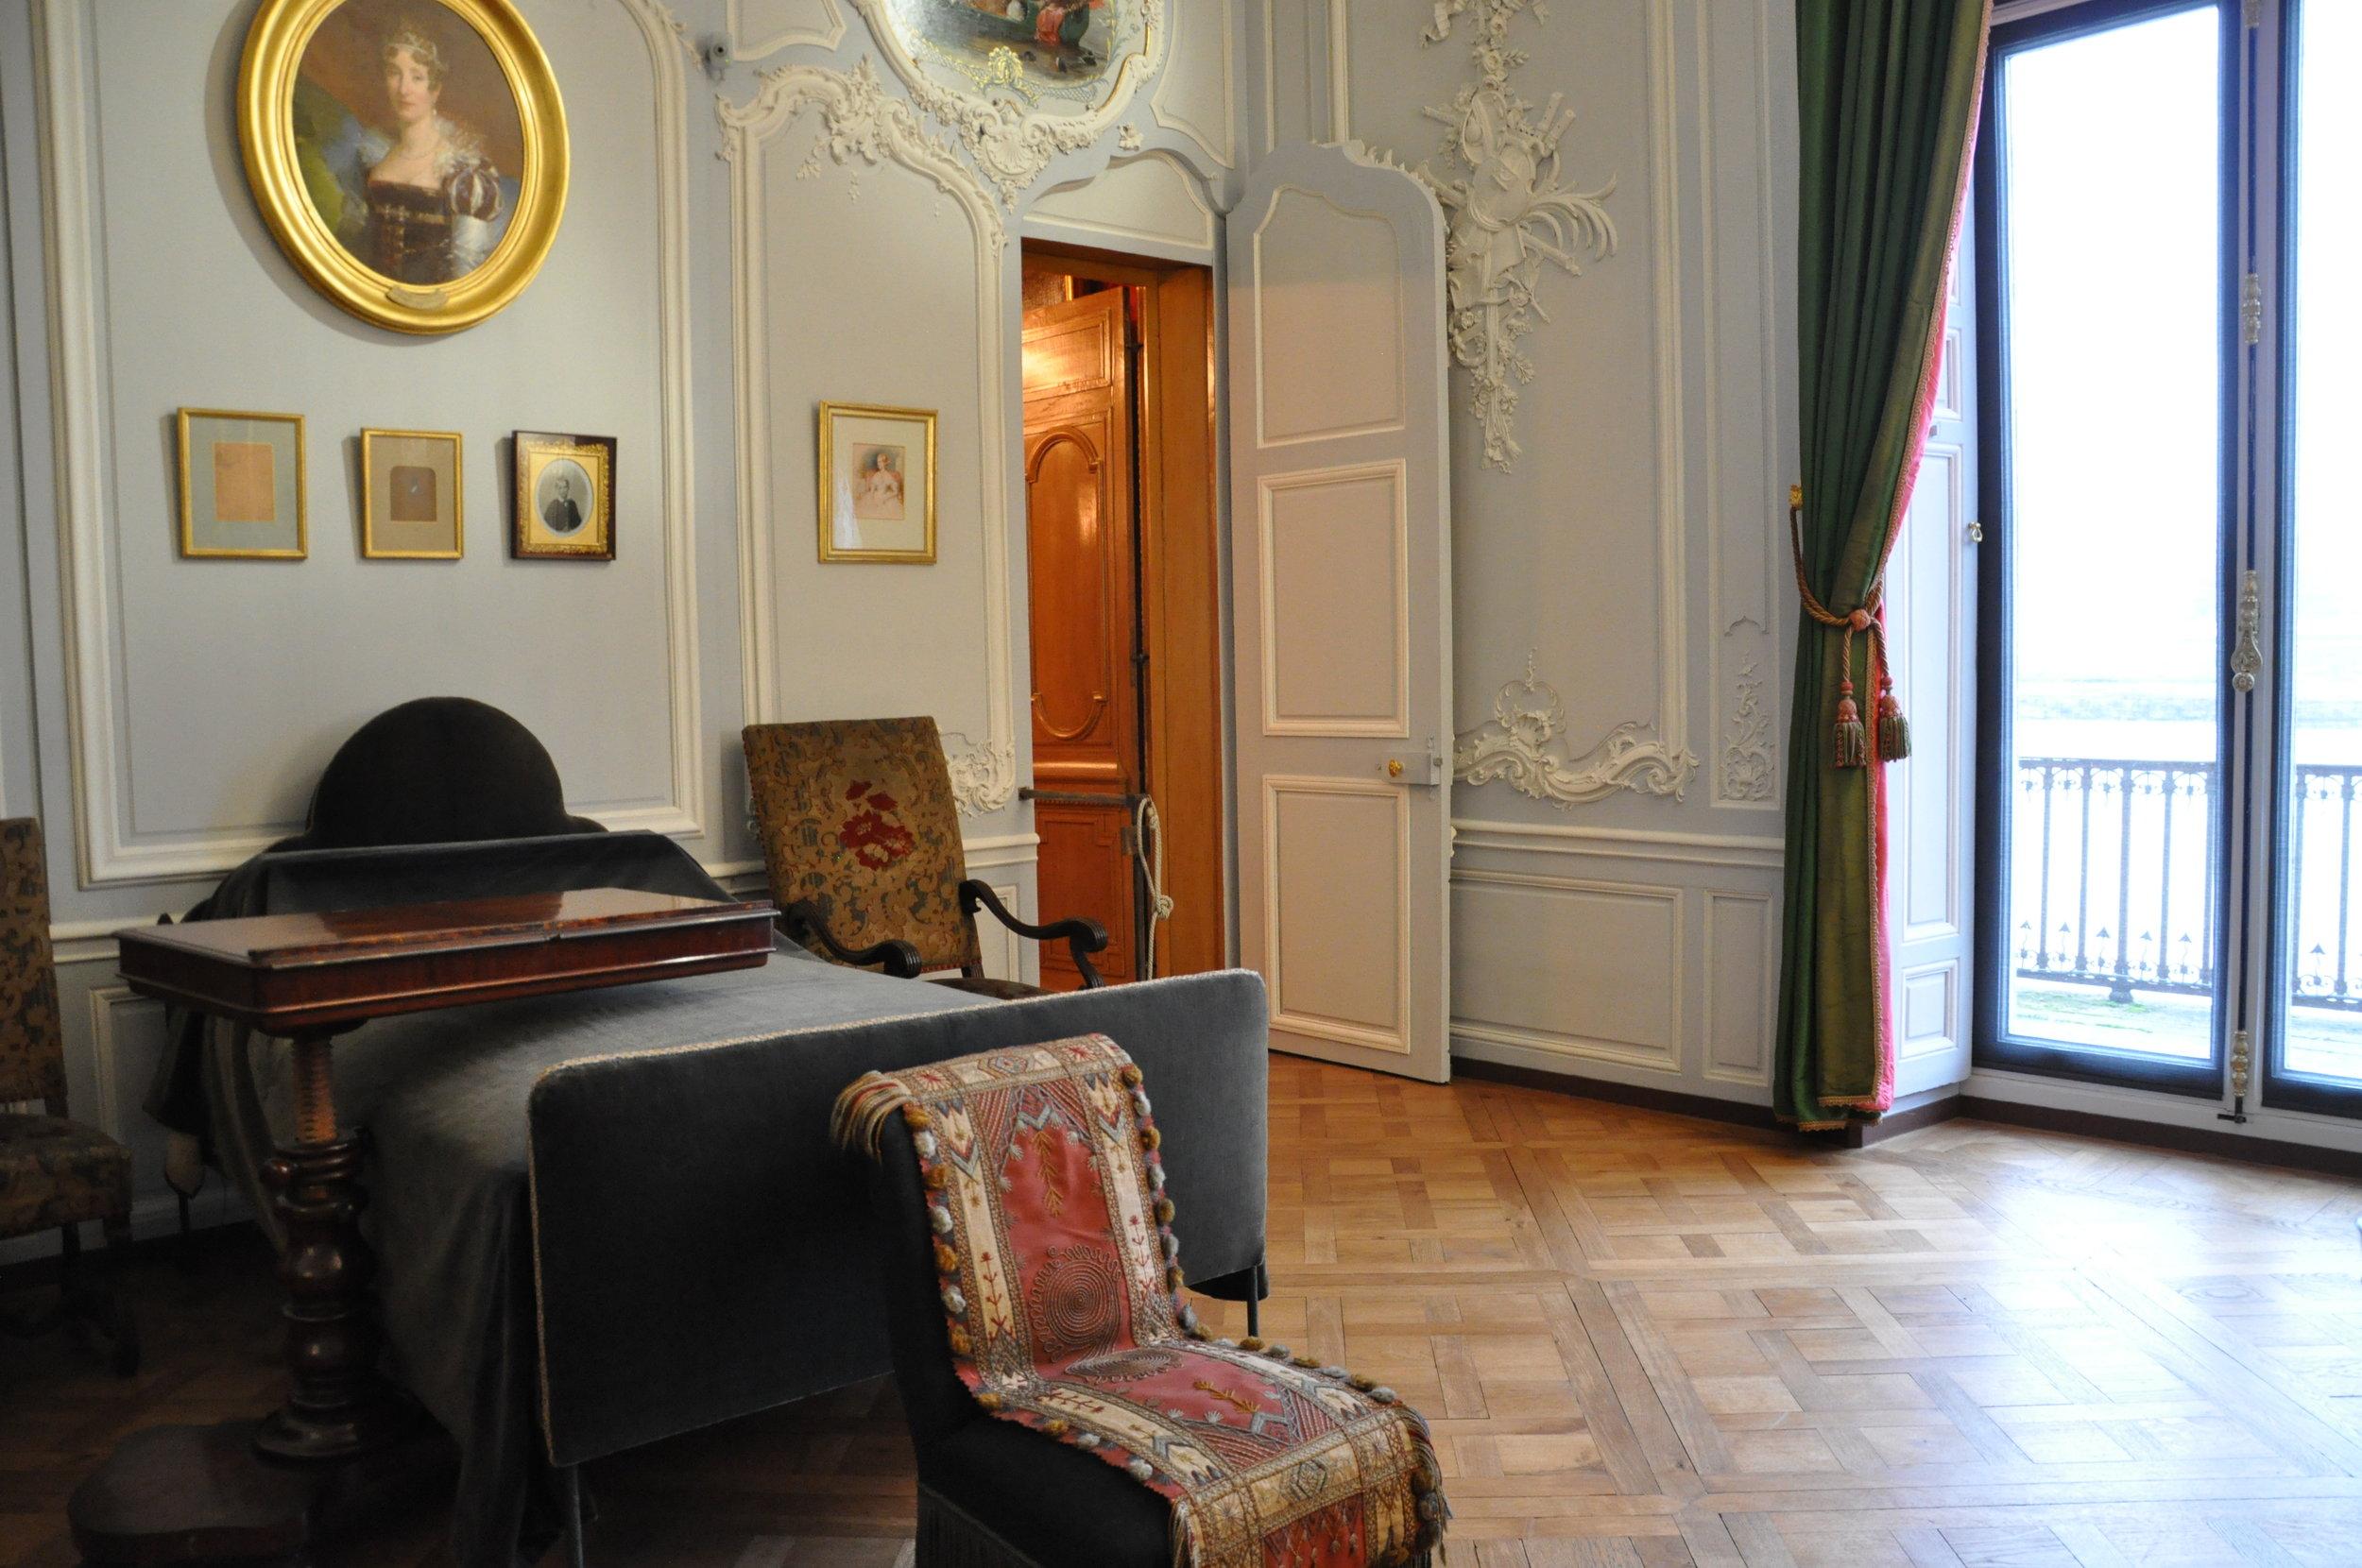 The Duke's bedroom © Grand Palais Domaine de Chantilly